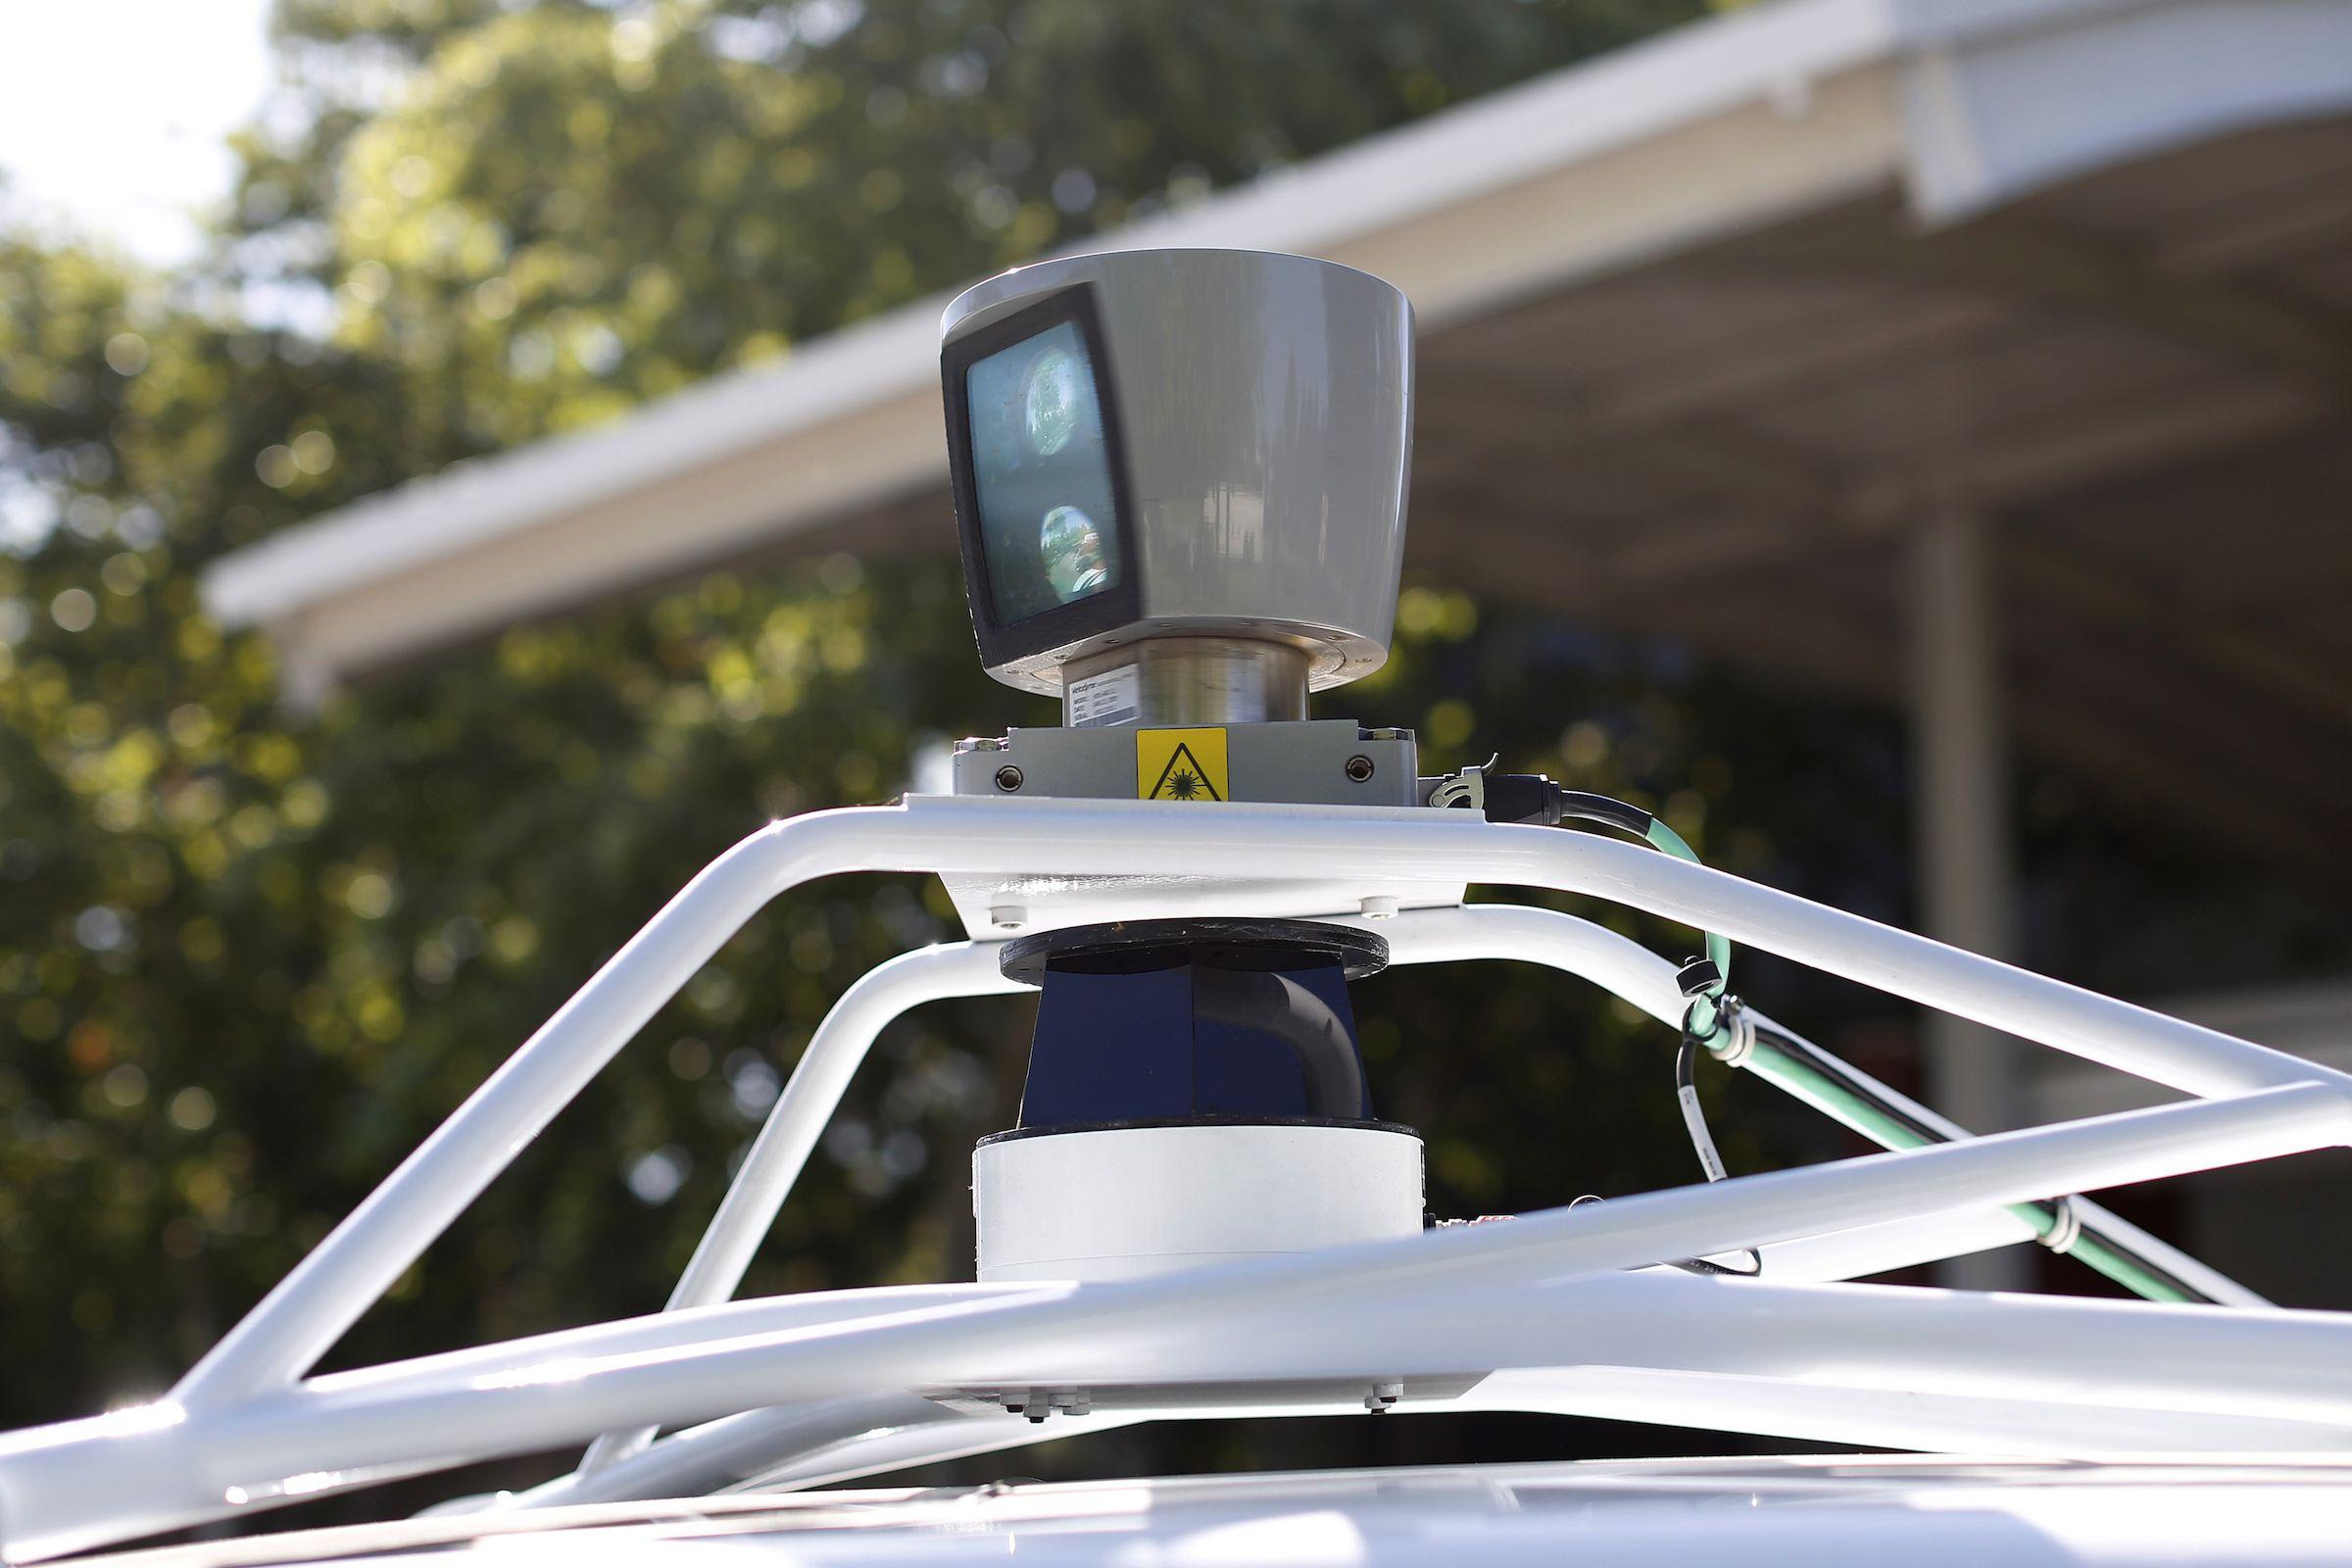 The sensor on top of Google's self-driving car.